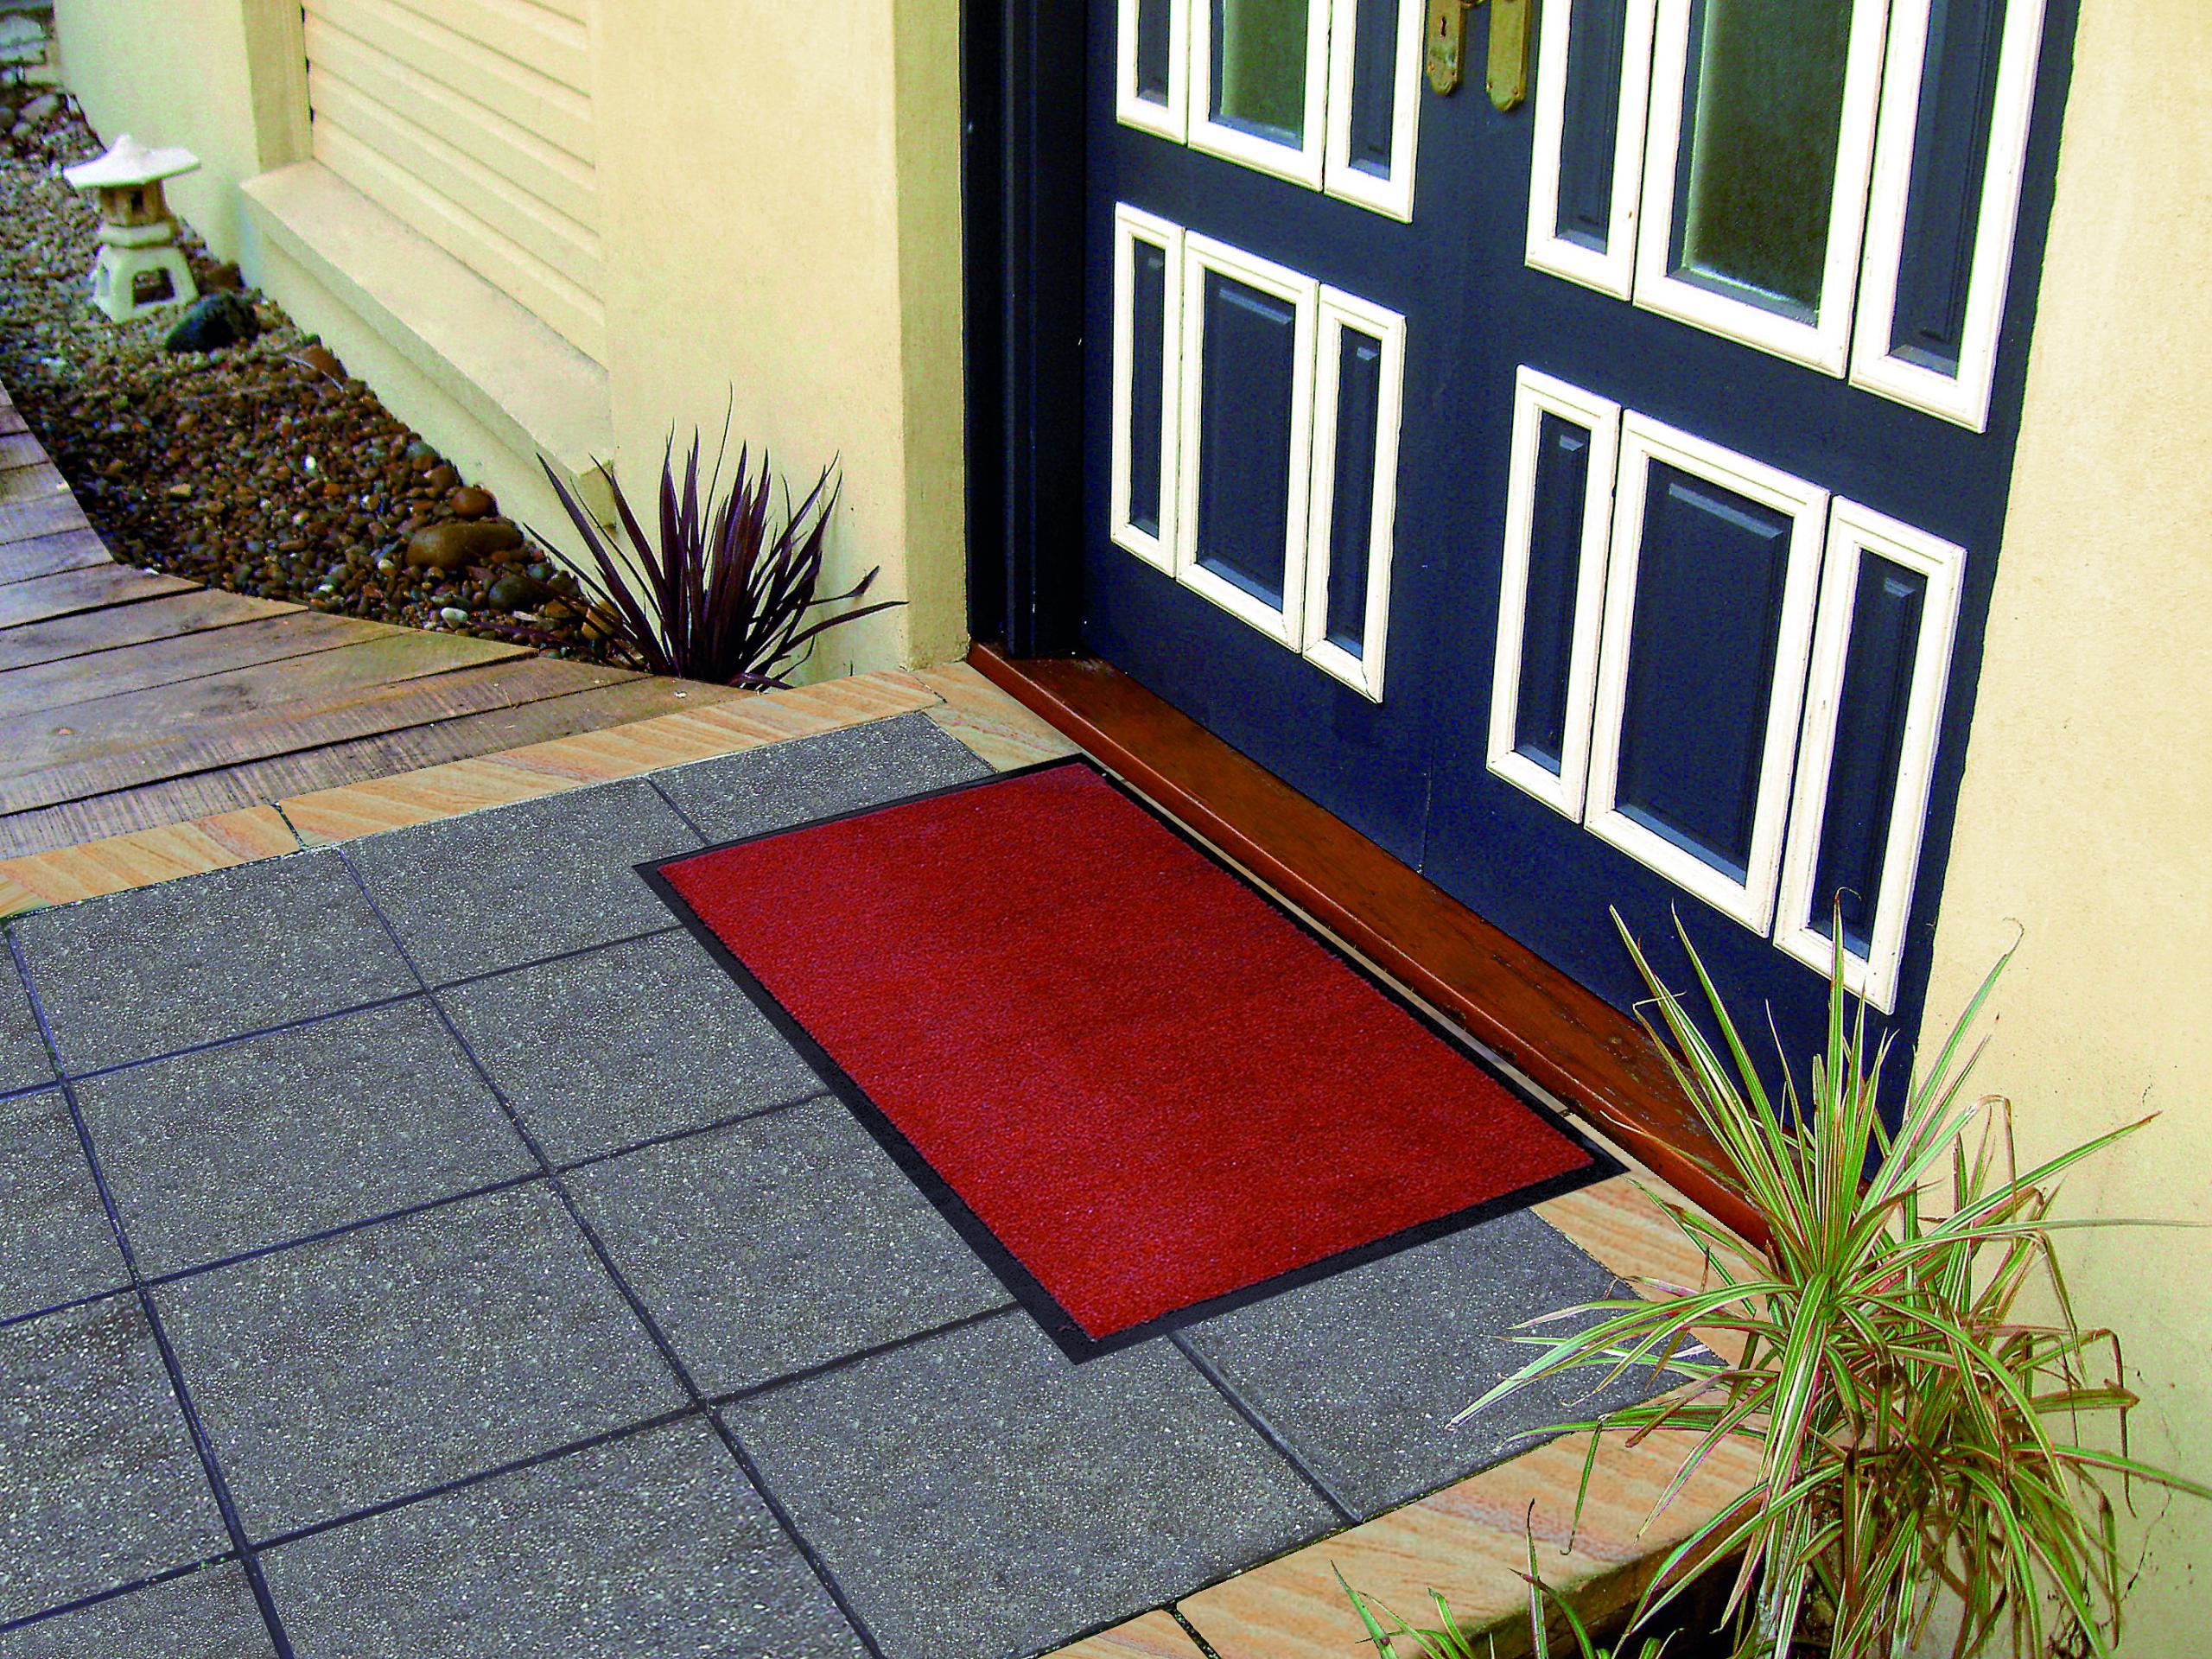 floor-shield-entrance-mat-at-door